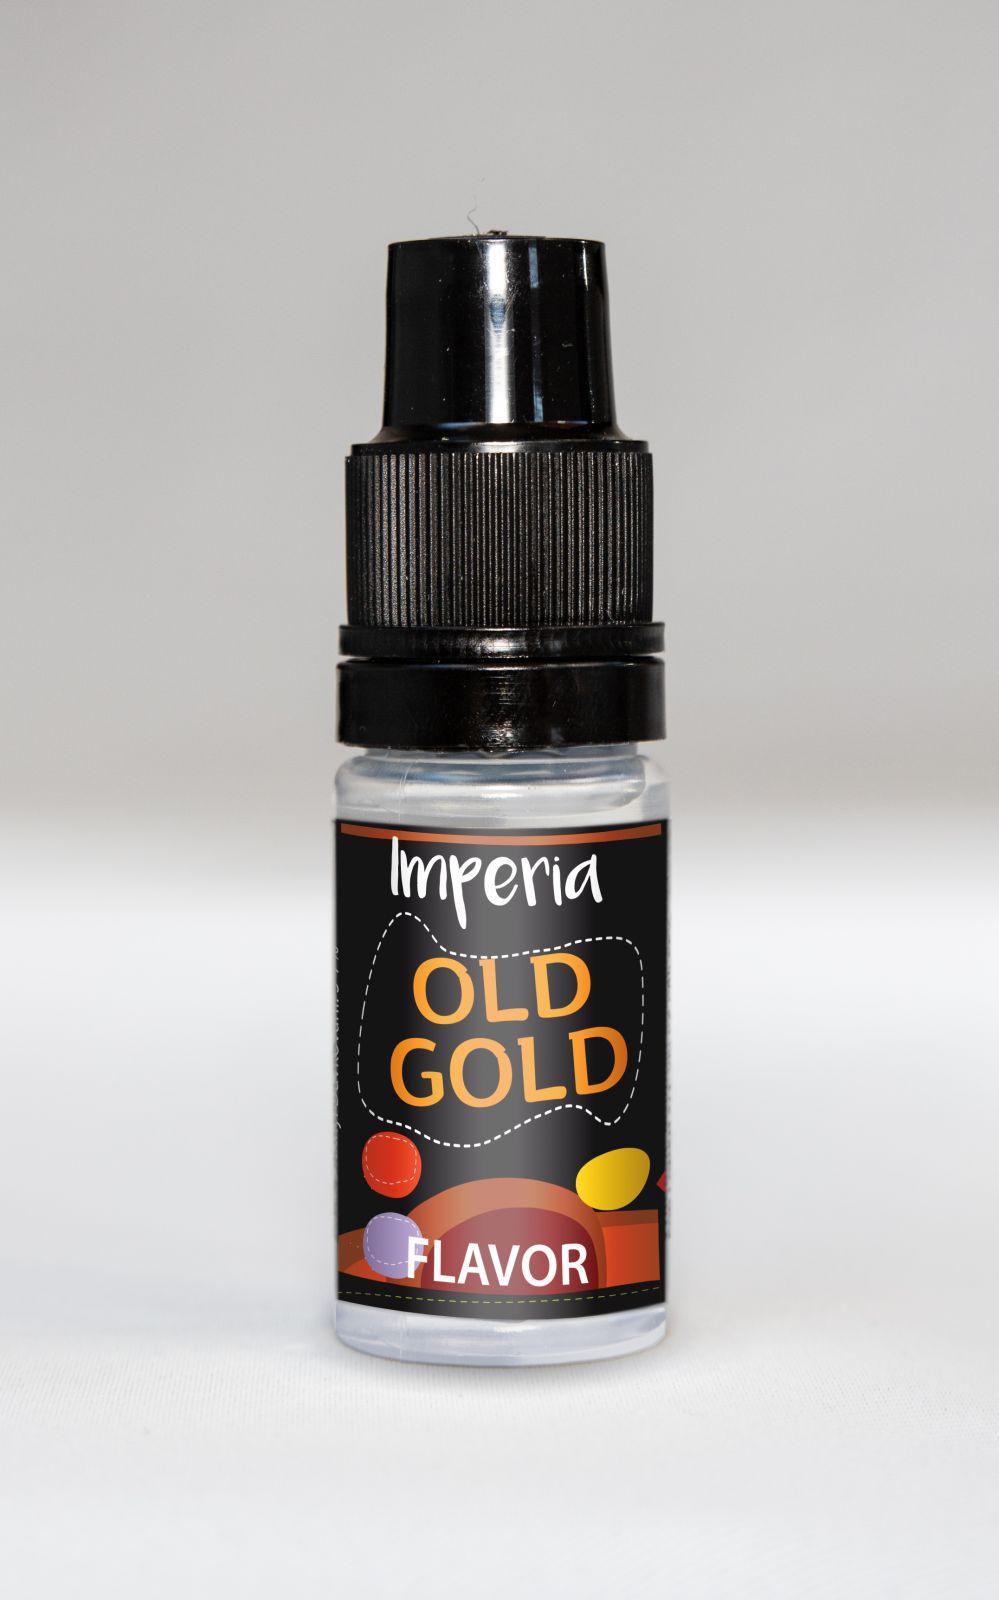 OLD GOLD - Aroma Imperia Black Label Boudoir Samadhi s.r.o.